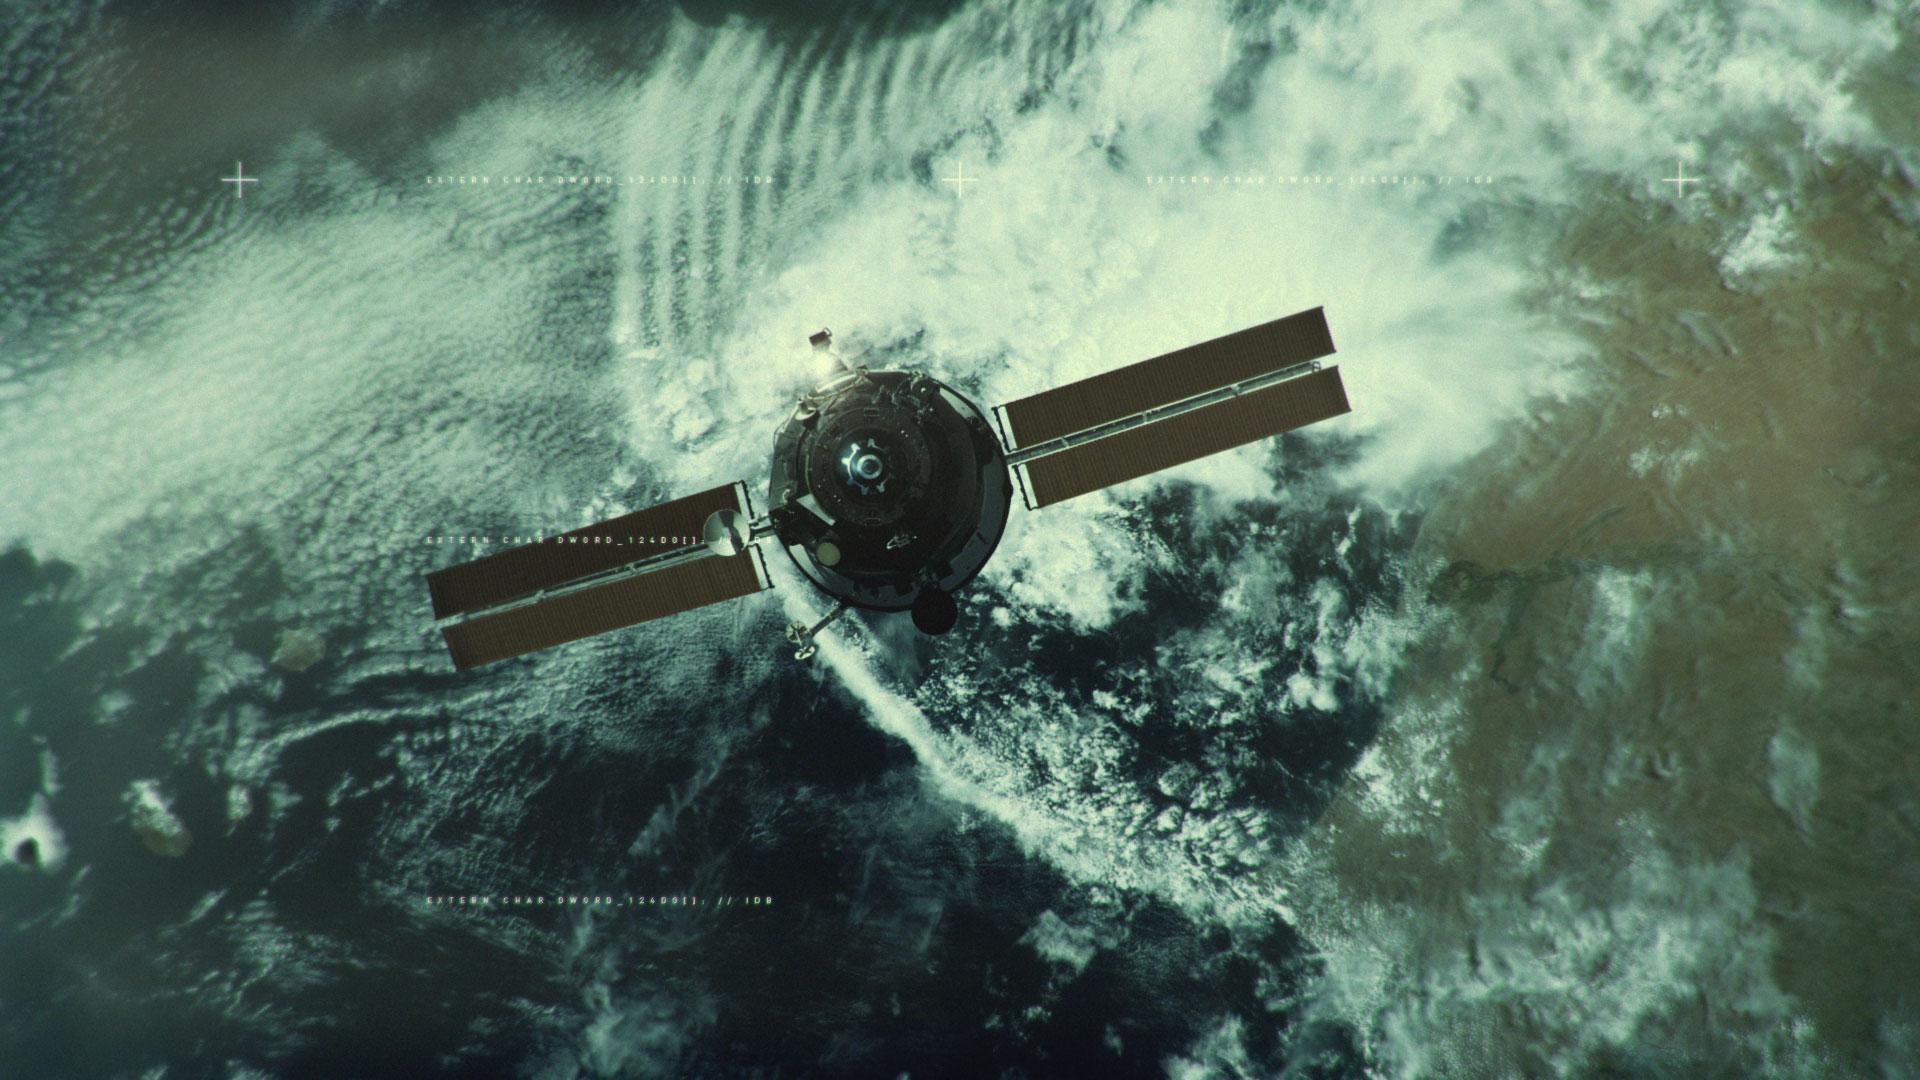 "<a href=""/asteroid-final-impact"">Asteroid: Final Impact</a>"